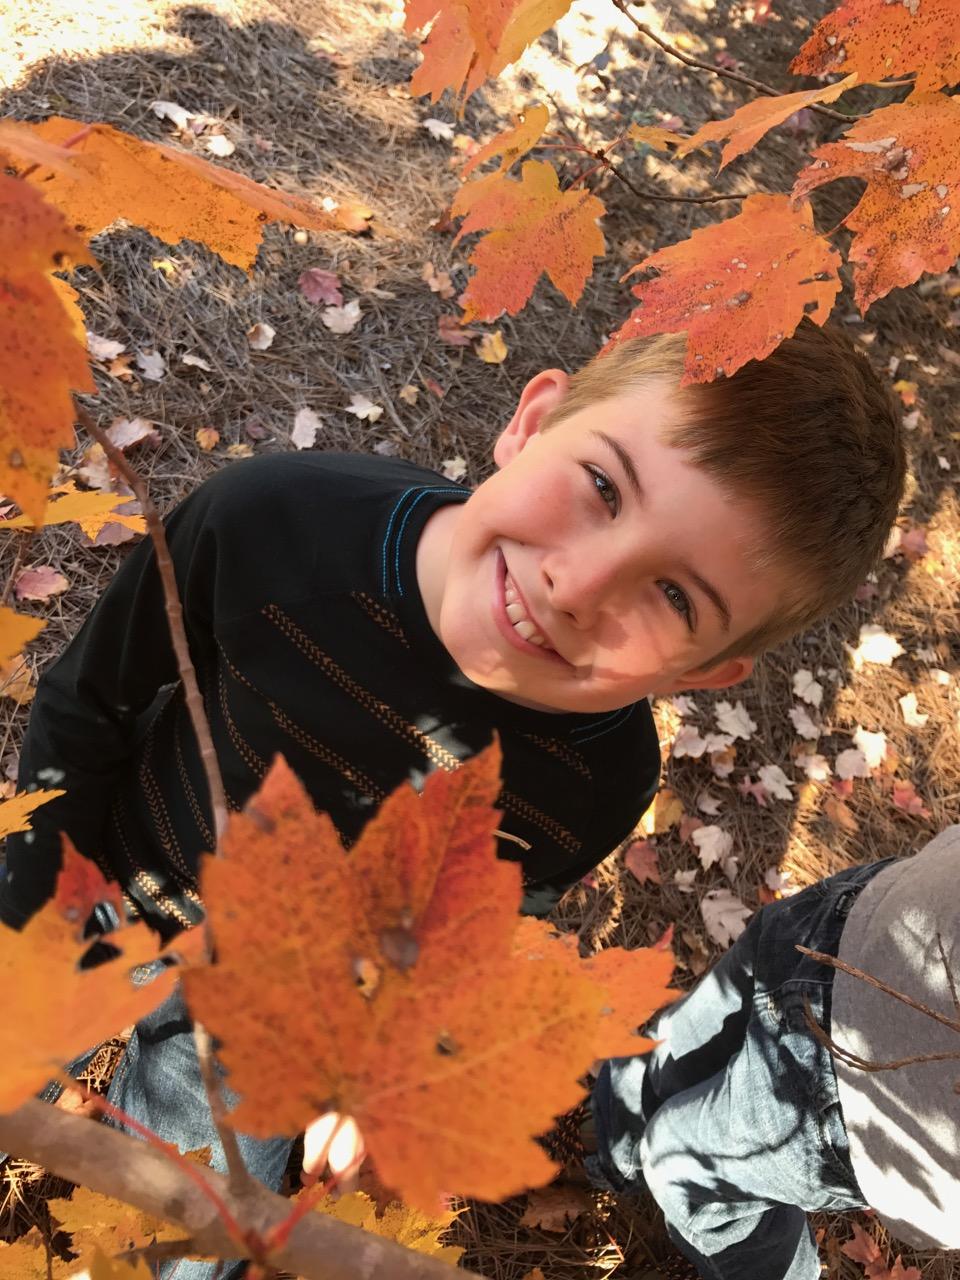 Fall leaves inHolly Springs, NC